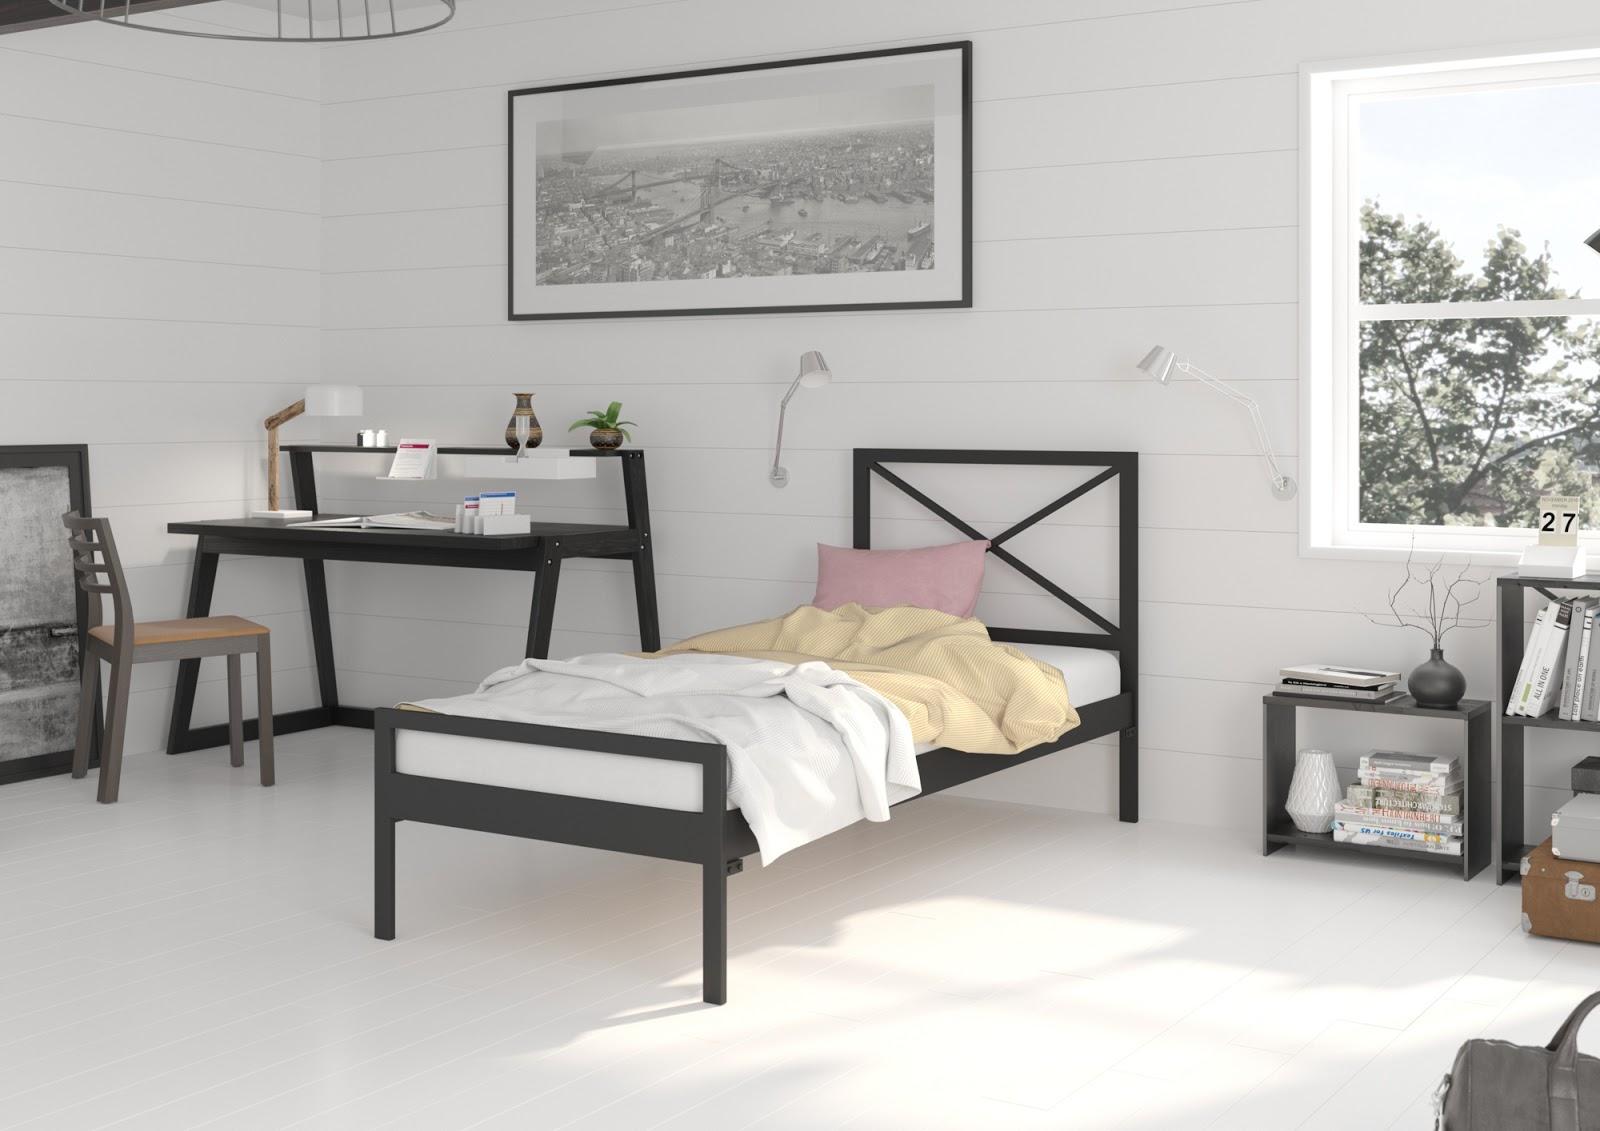 Łóżko metalowe wzór 38 (80-100 cm)